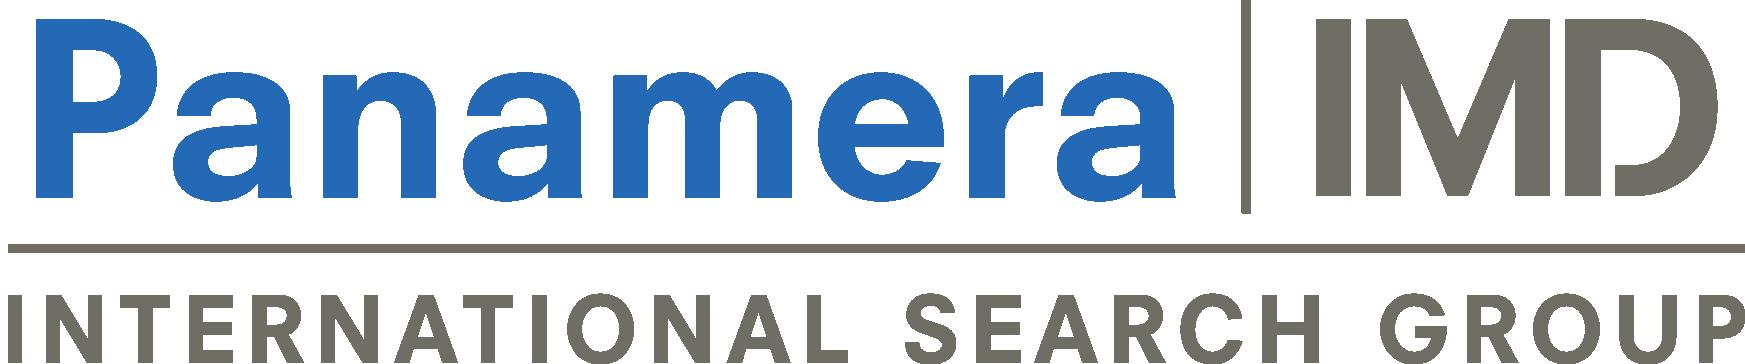 panamera imd international search group home